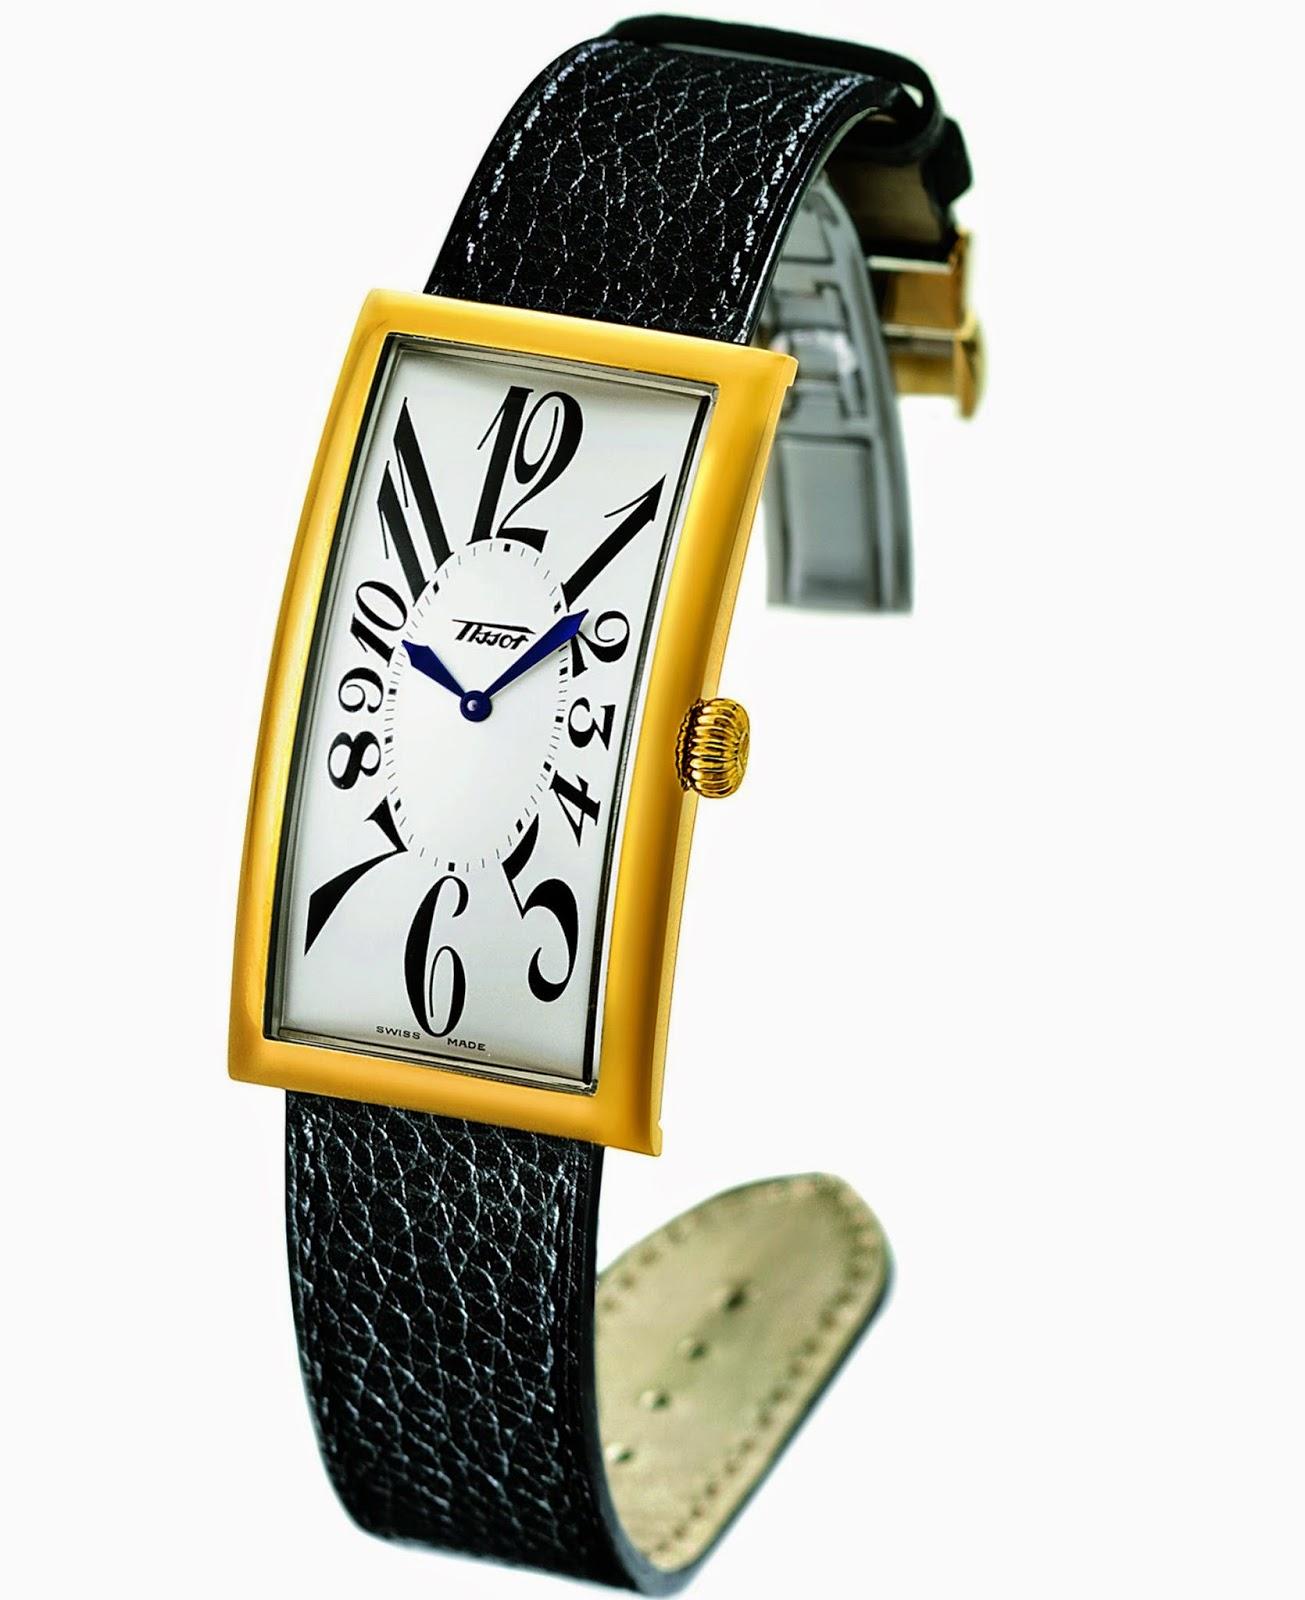 TISSOT Classic Prince quartz watch